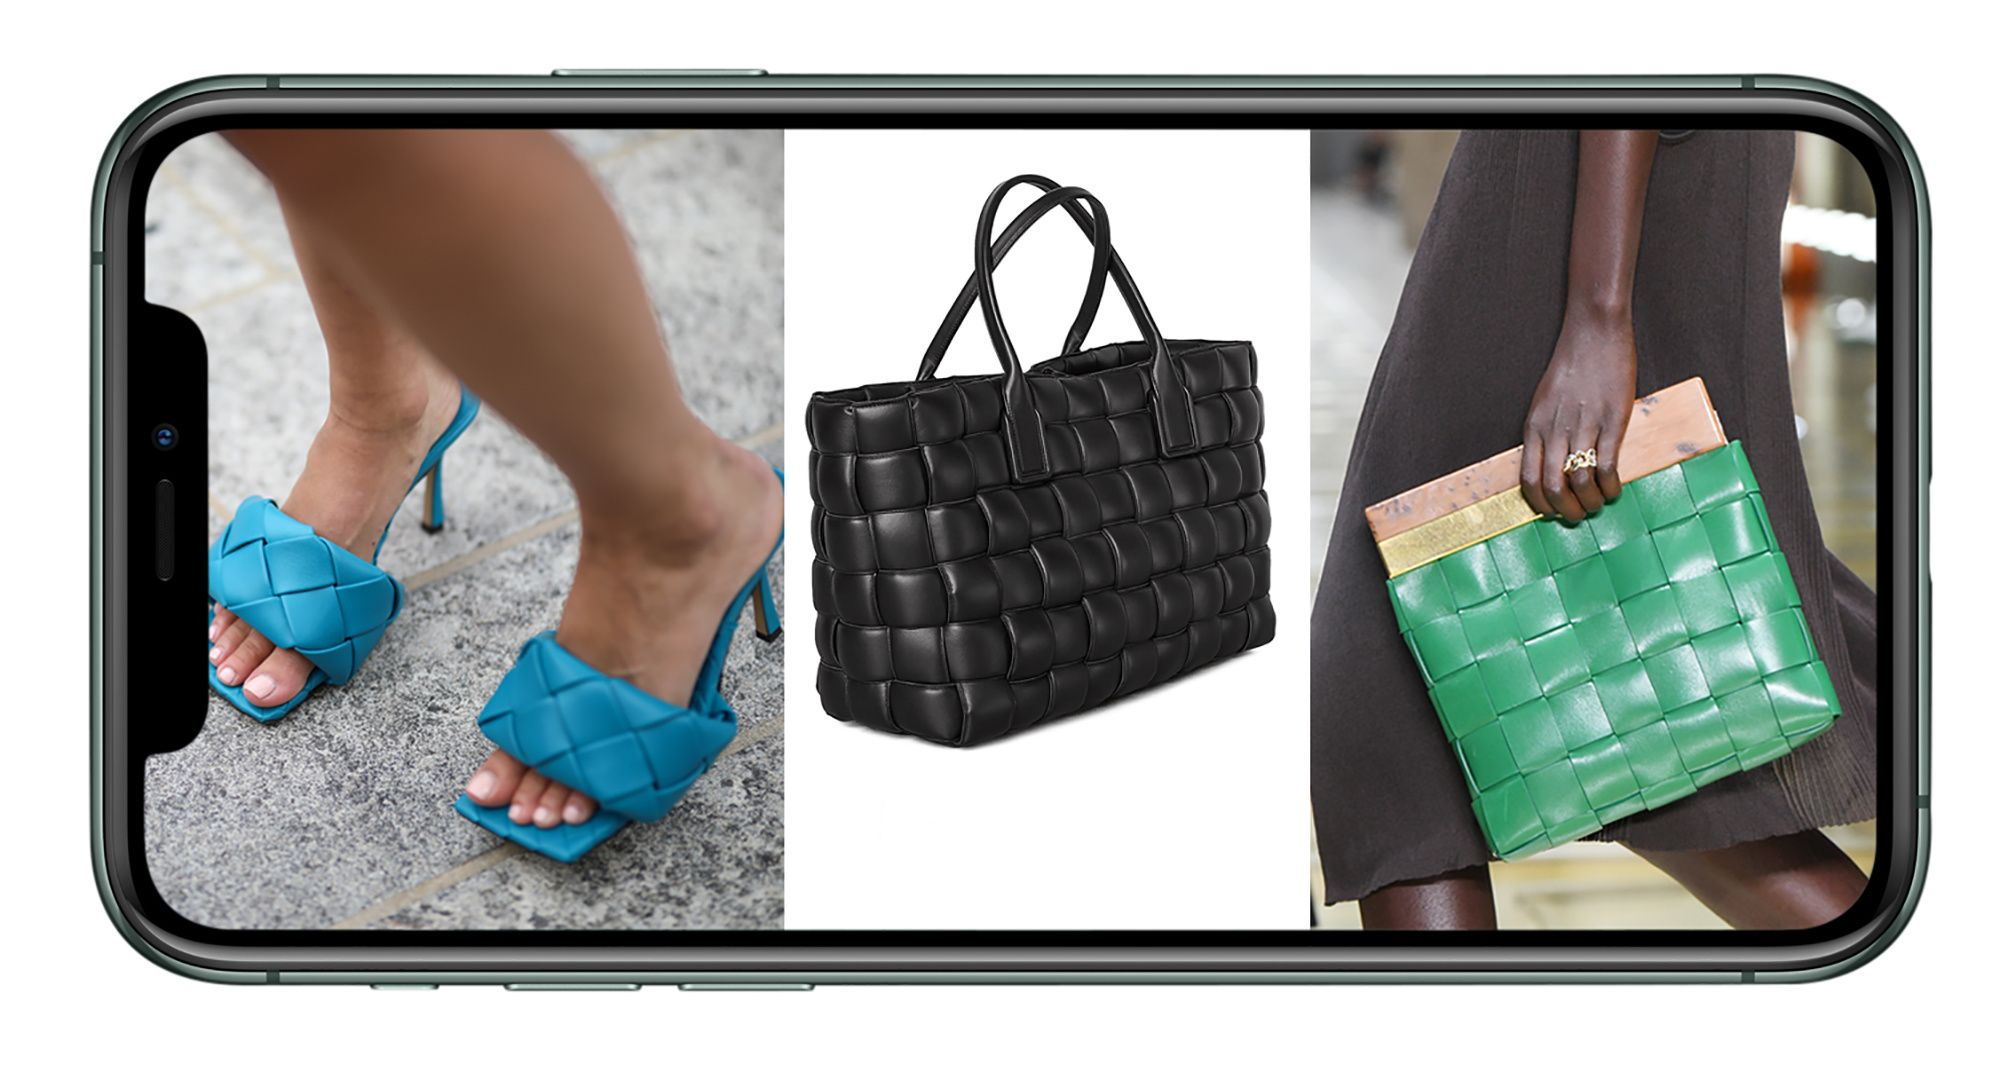 Bottega Veneta high-heels sandals, large tote, and square clutch purse.